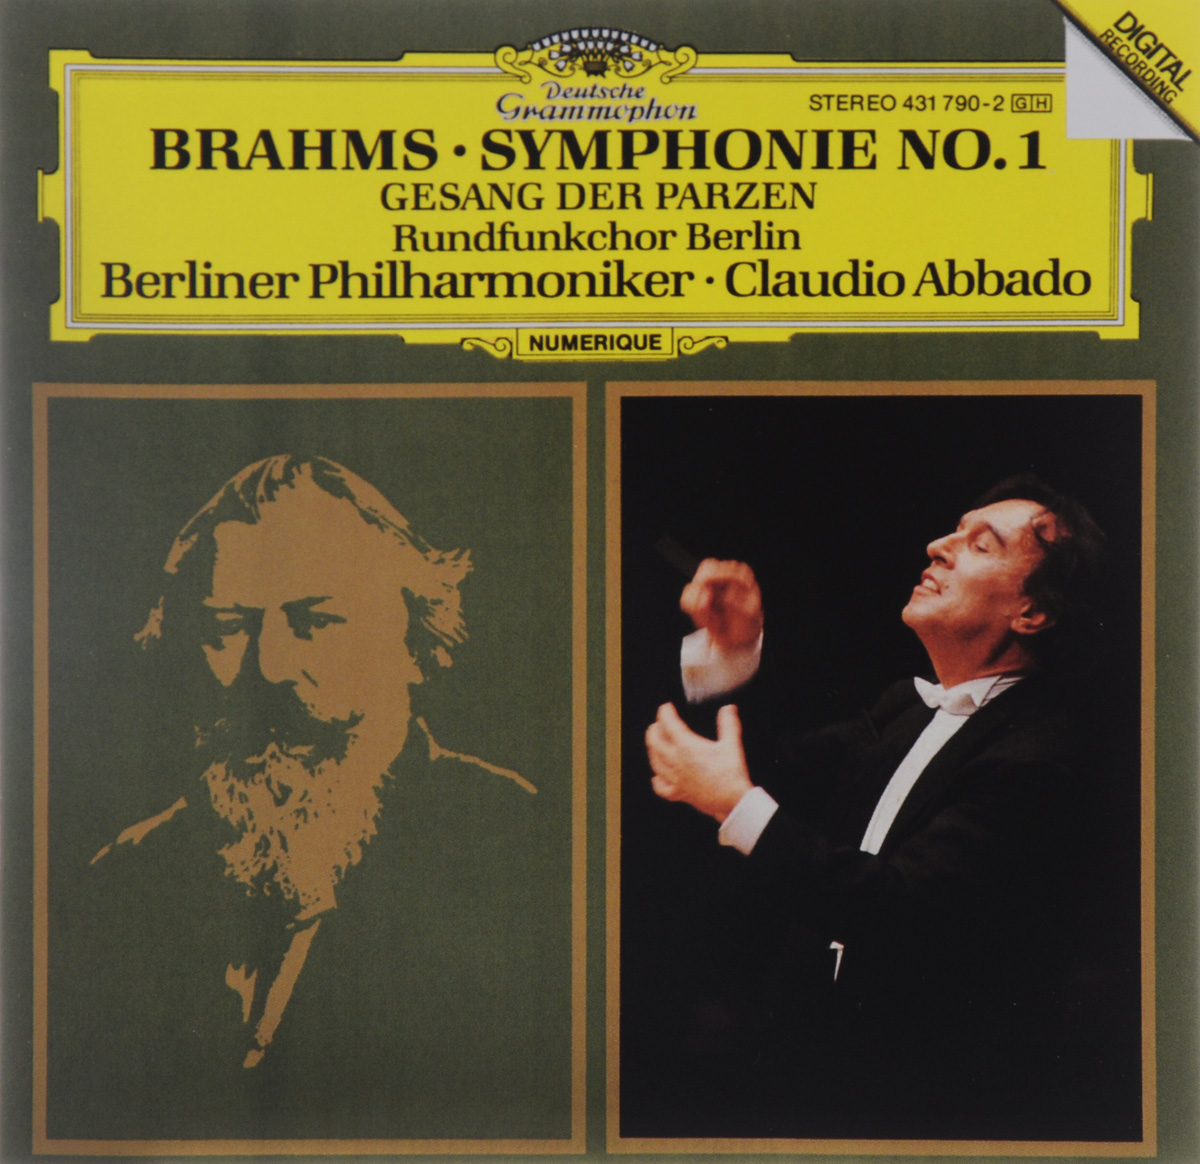 Клаудио Аббадо,Rundfunkchor Berlin,Berliner Philharmoniker Claudio Abbado. Brahms. Symphonie No. 1 / Gesang Der Parzen саймон хелси мария тодтенхаупт йерг штродтофф berliner rundfunkchor simon halsey morgenlicht